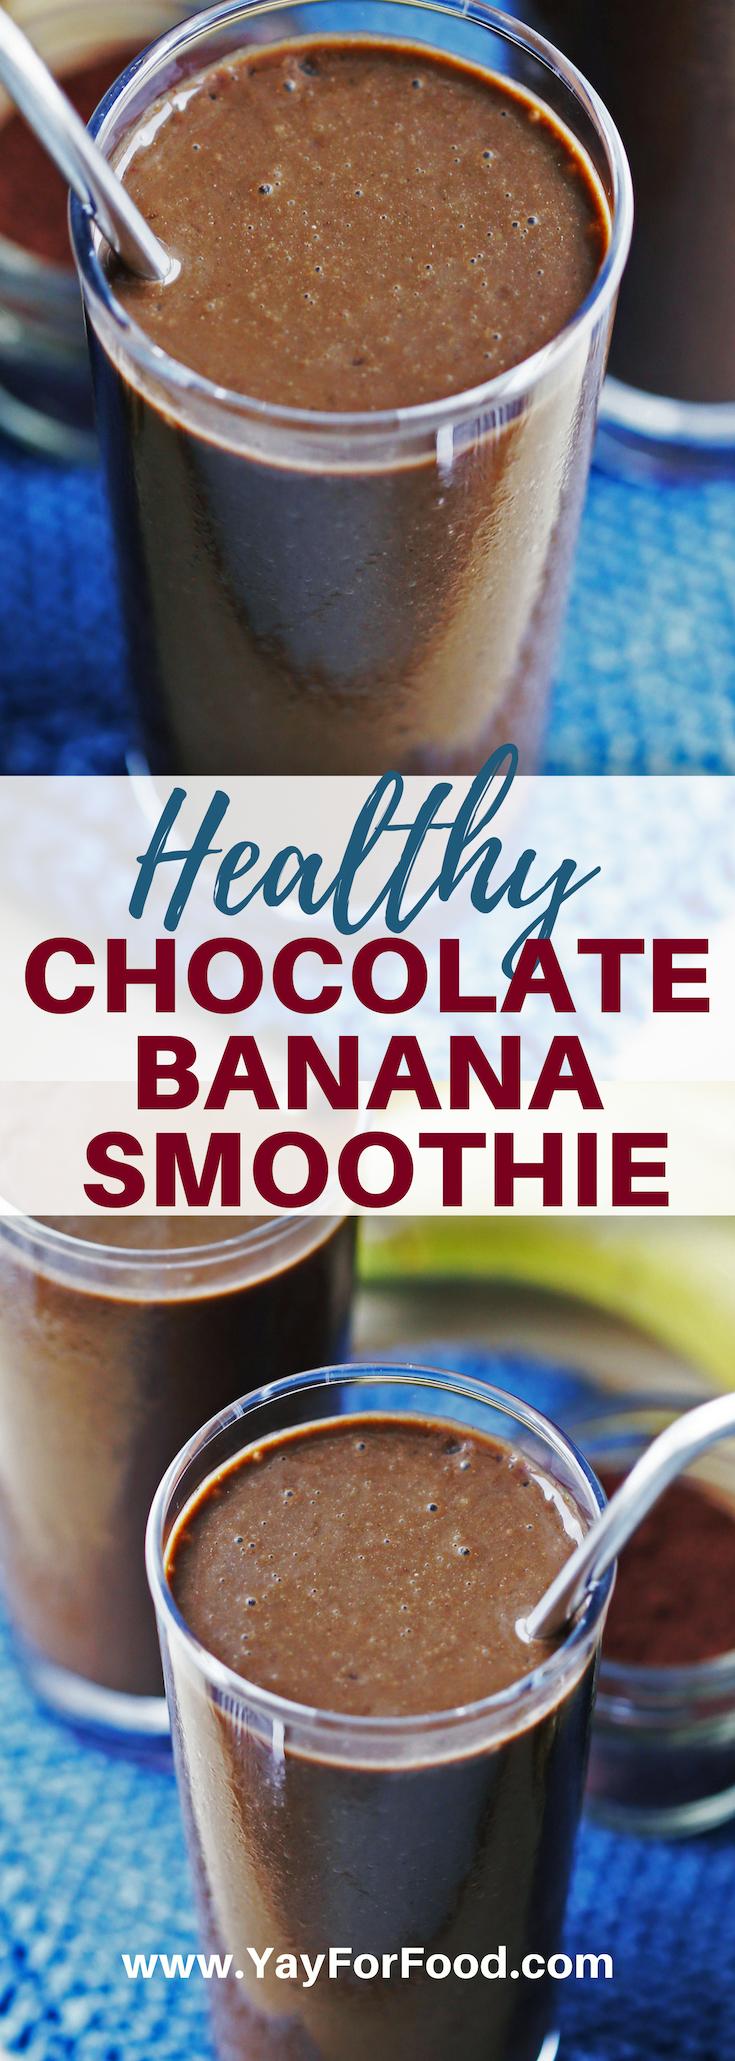 Healthy Chocolate Banana Smoothie #chocolatebananasmoothie